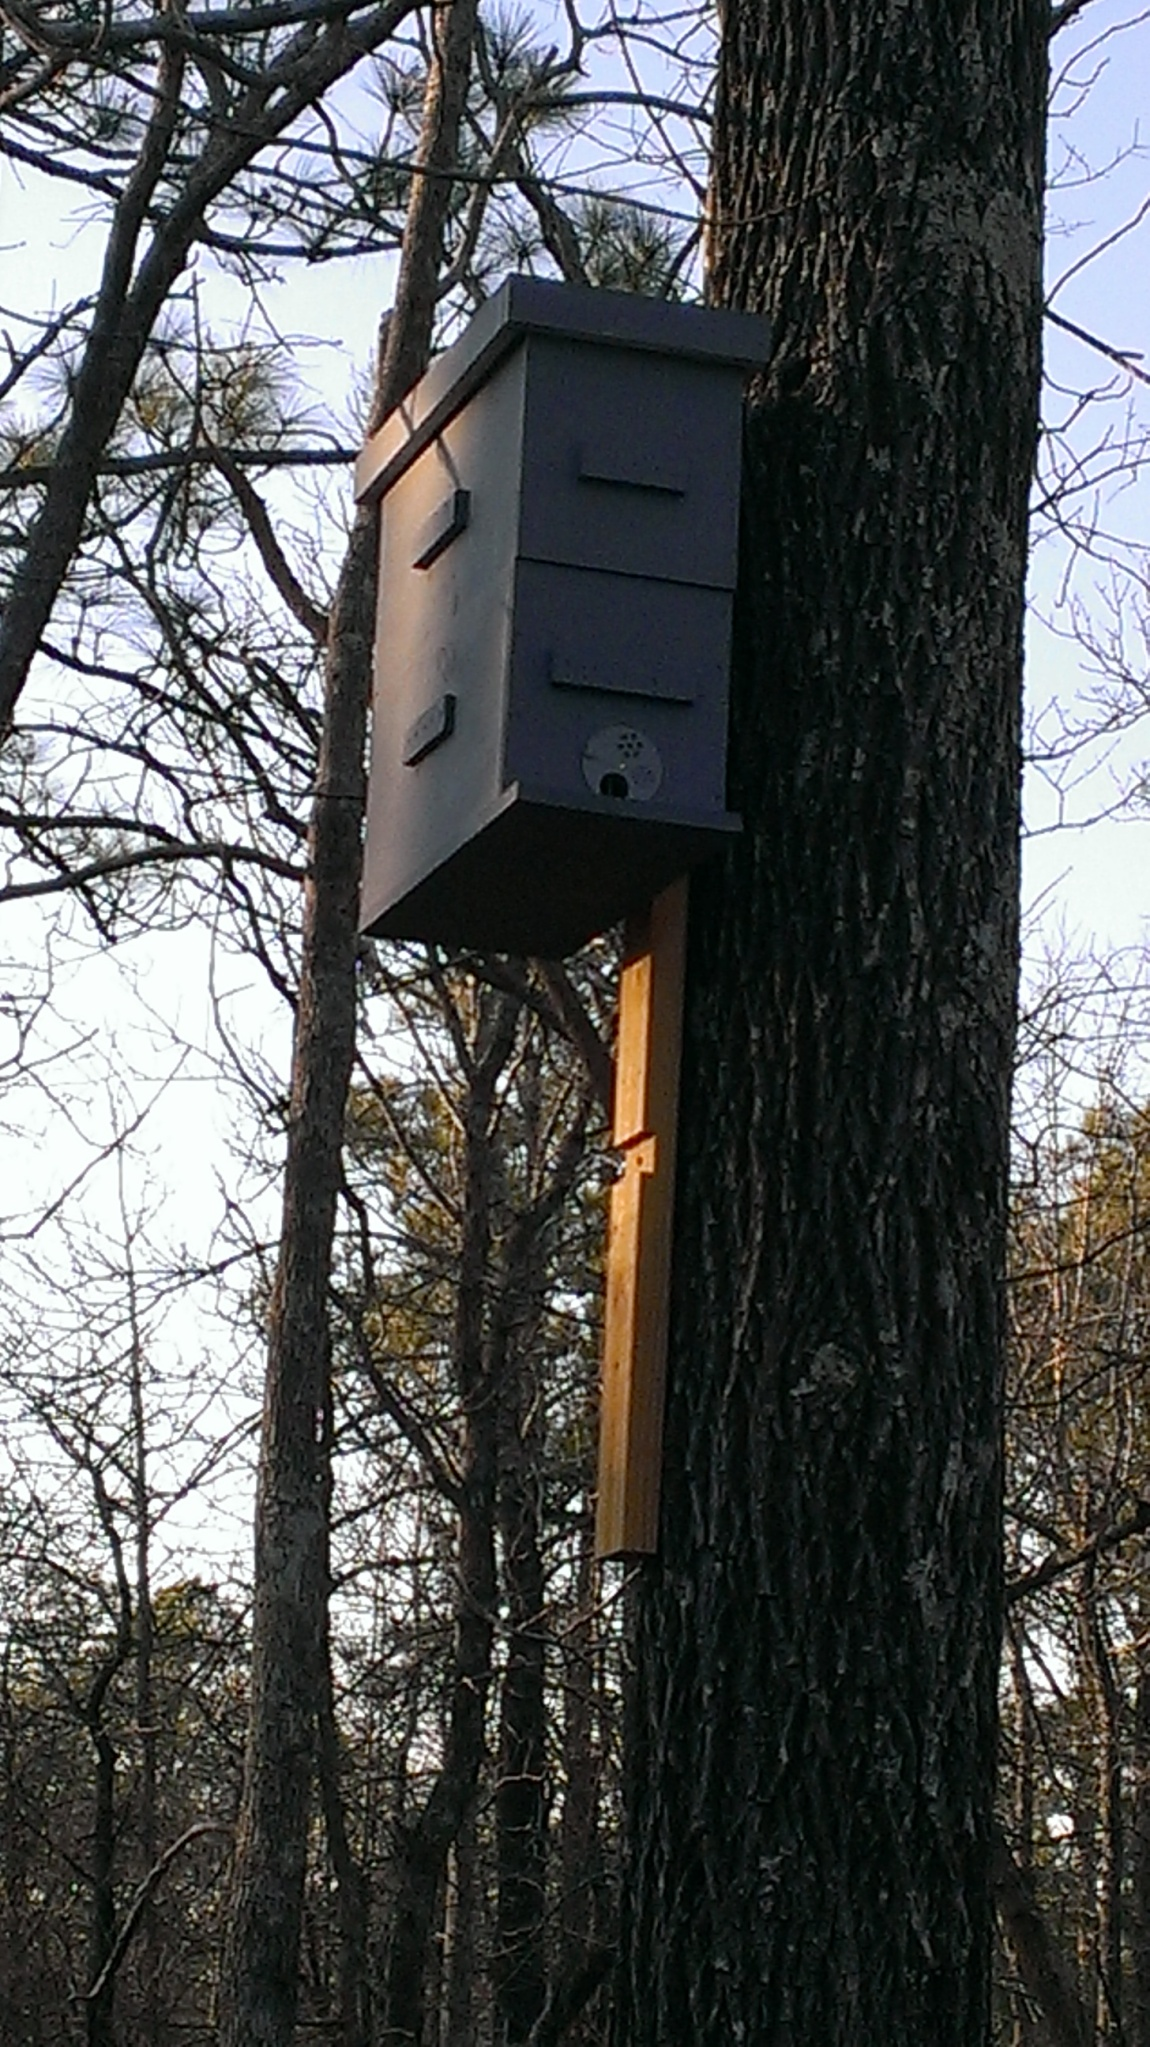 Swarm Trap in tree